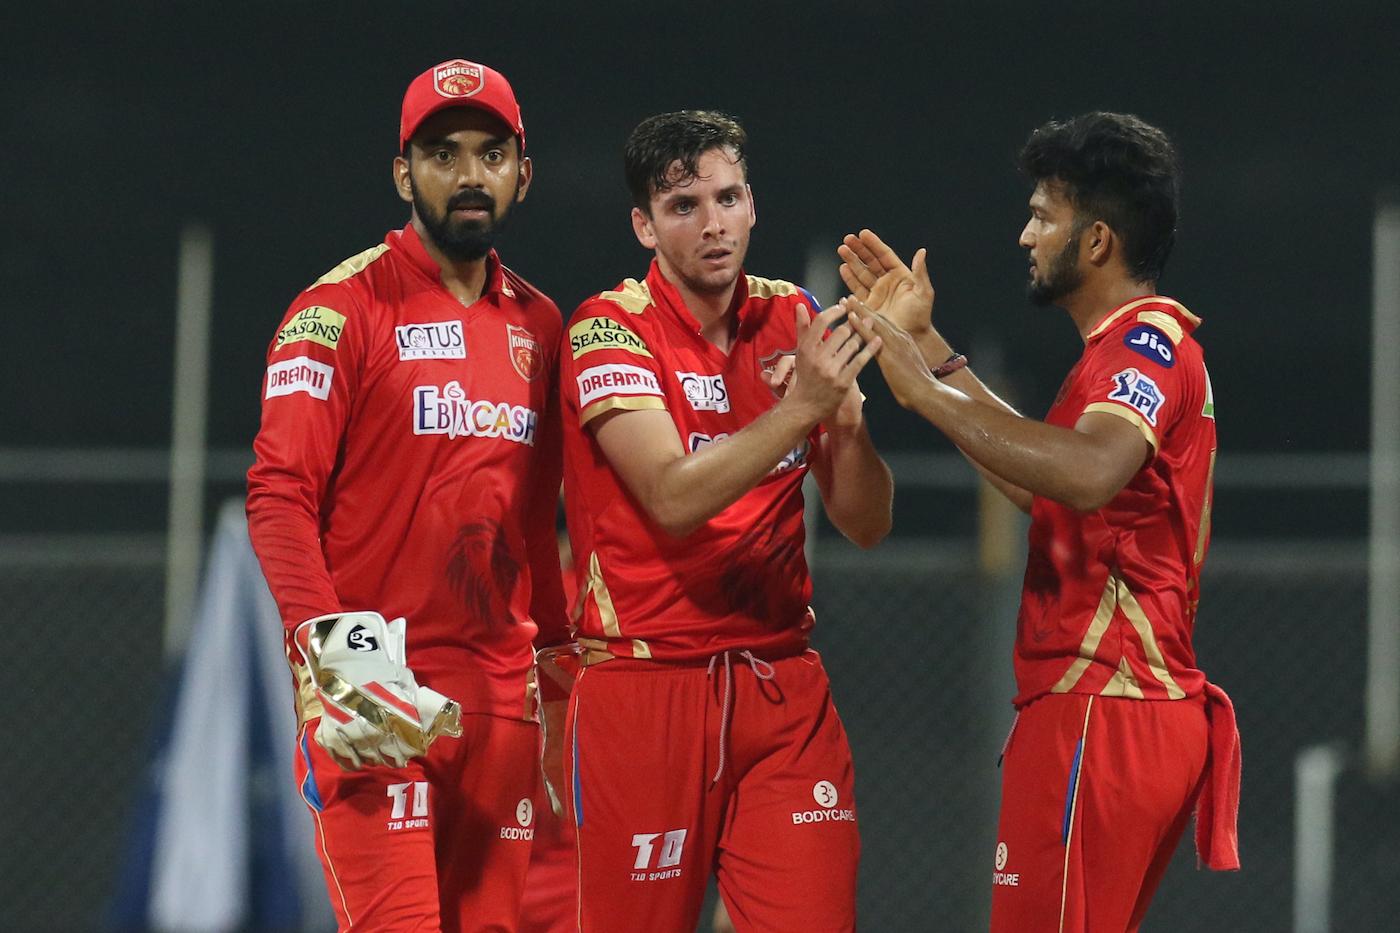 Punjab Kings batting is letting them down | BCCI-IPL